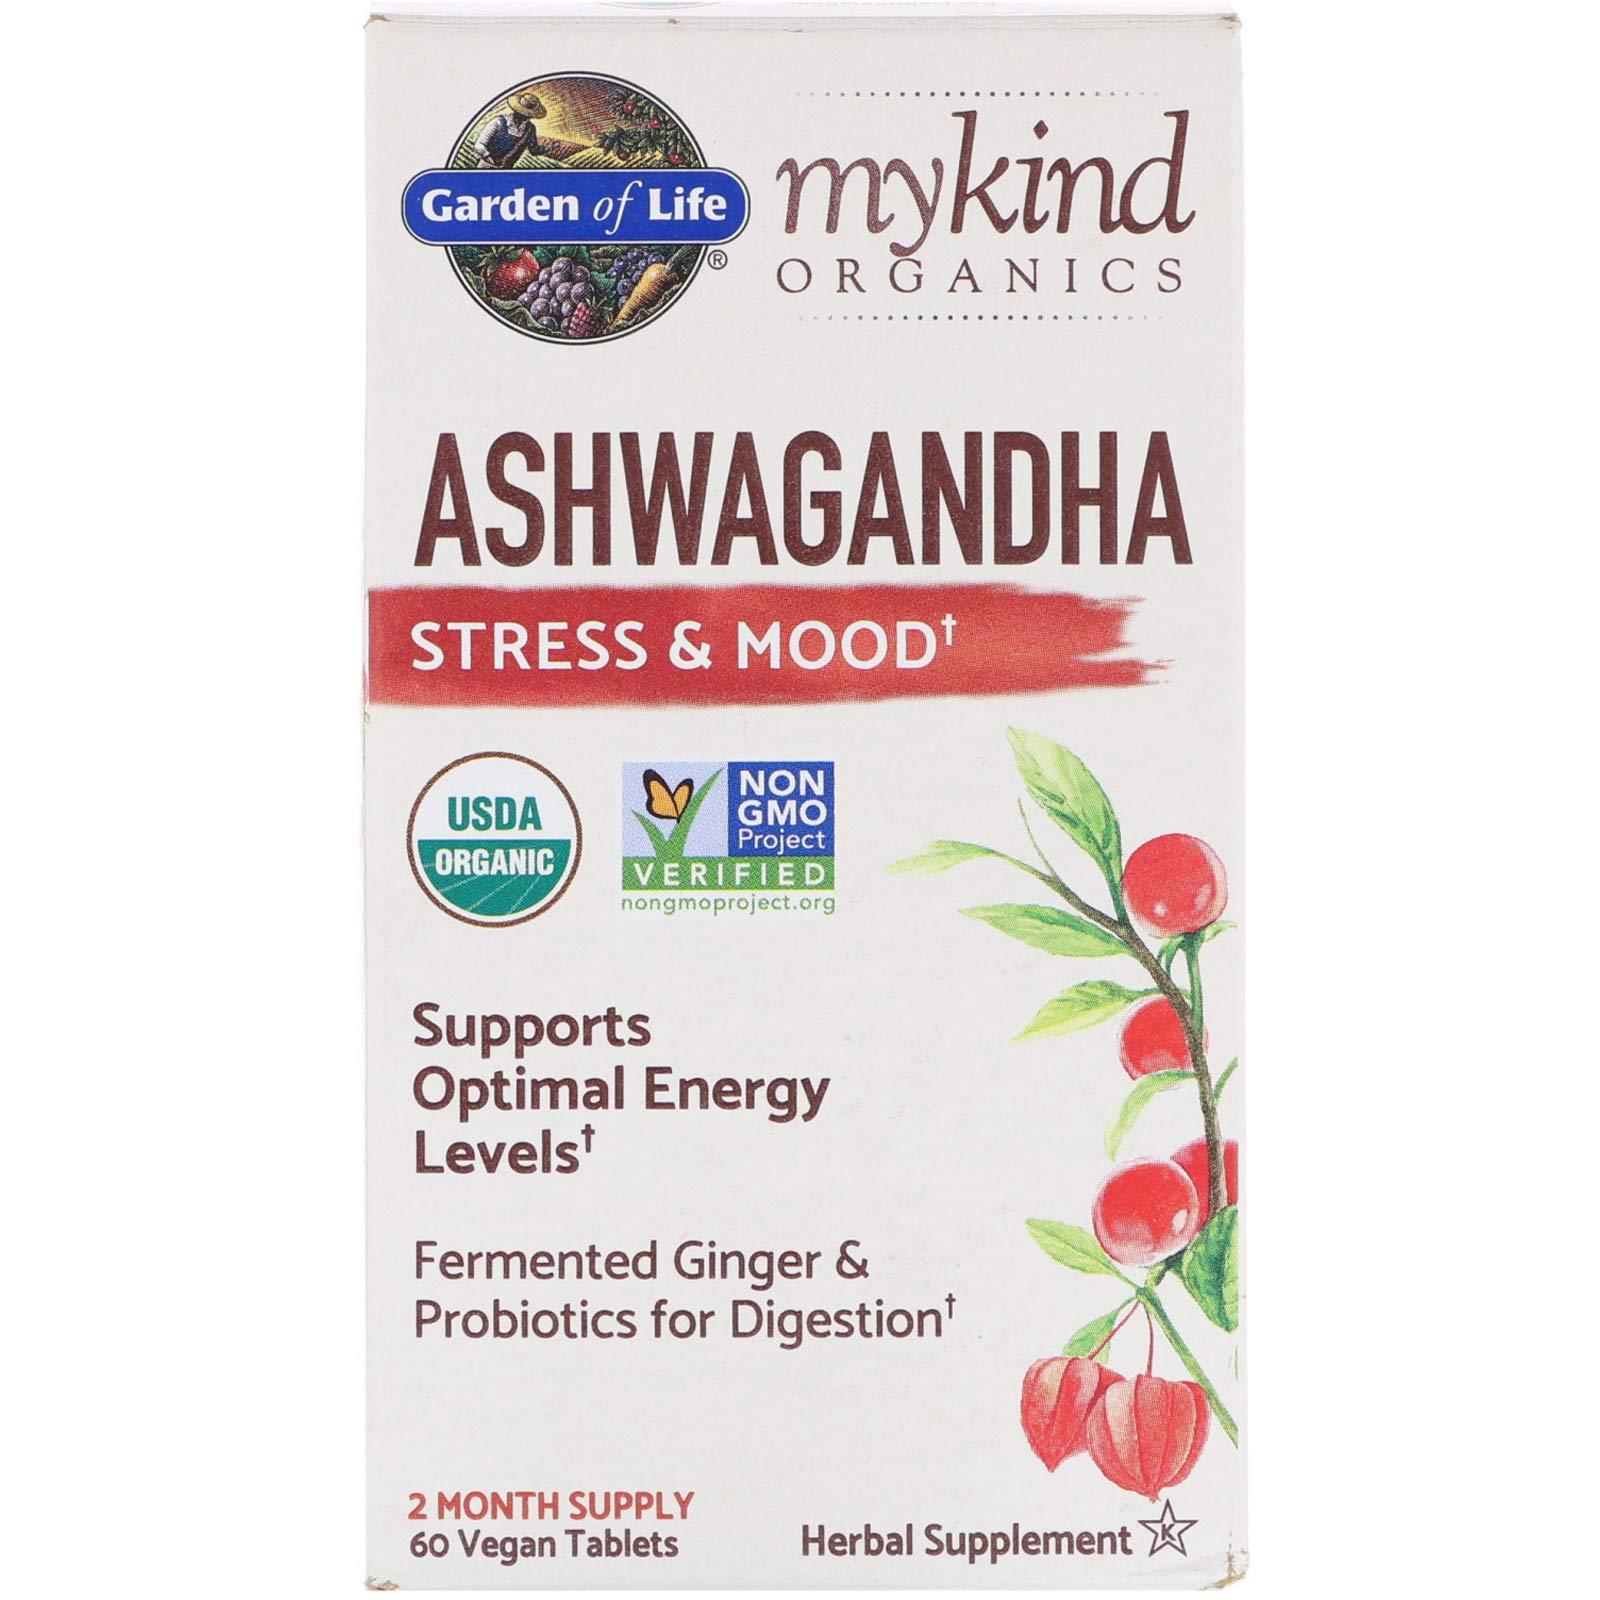 Garden of Life, MyKind Organics, Ashwagandha, Stress & Mood, 60 Vegan Tablets